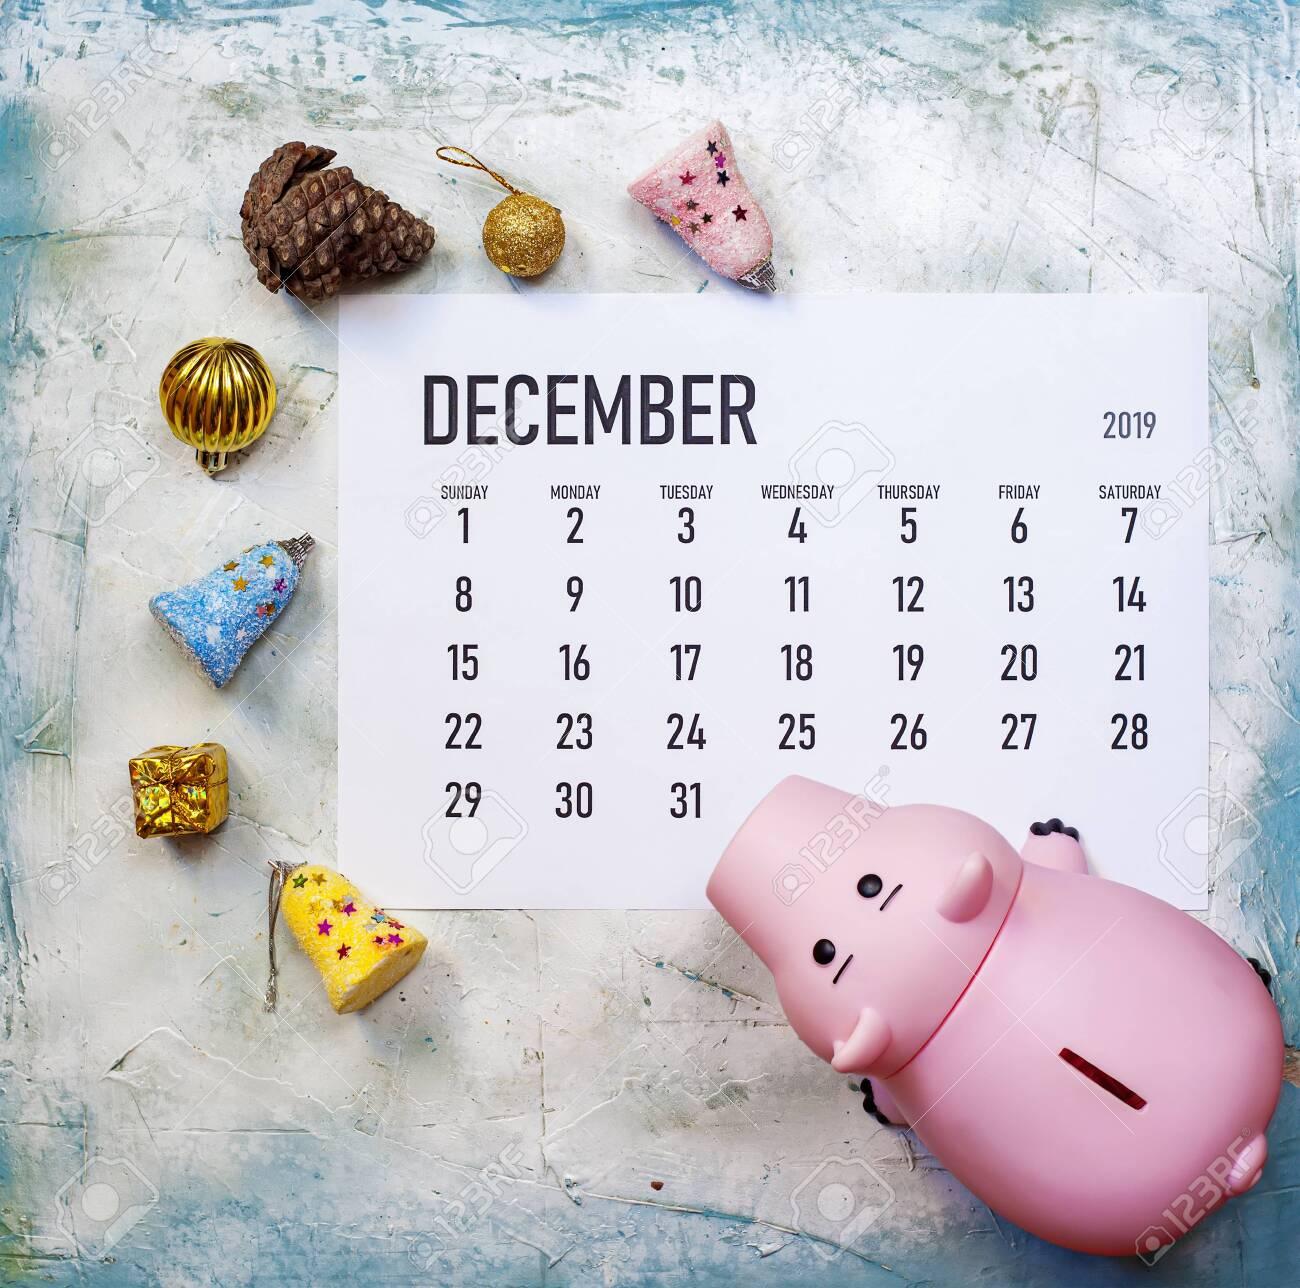 Christmas 2019 Calendar.December 2019 Calendar With Christmas Toys And Piggy Bank Planning